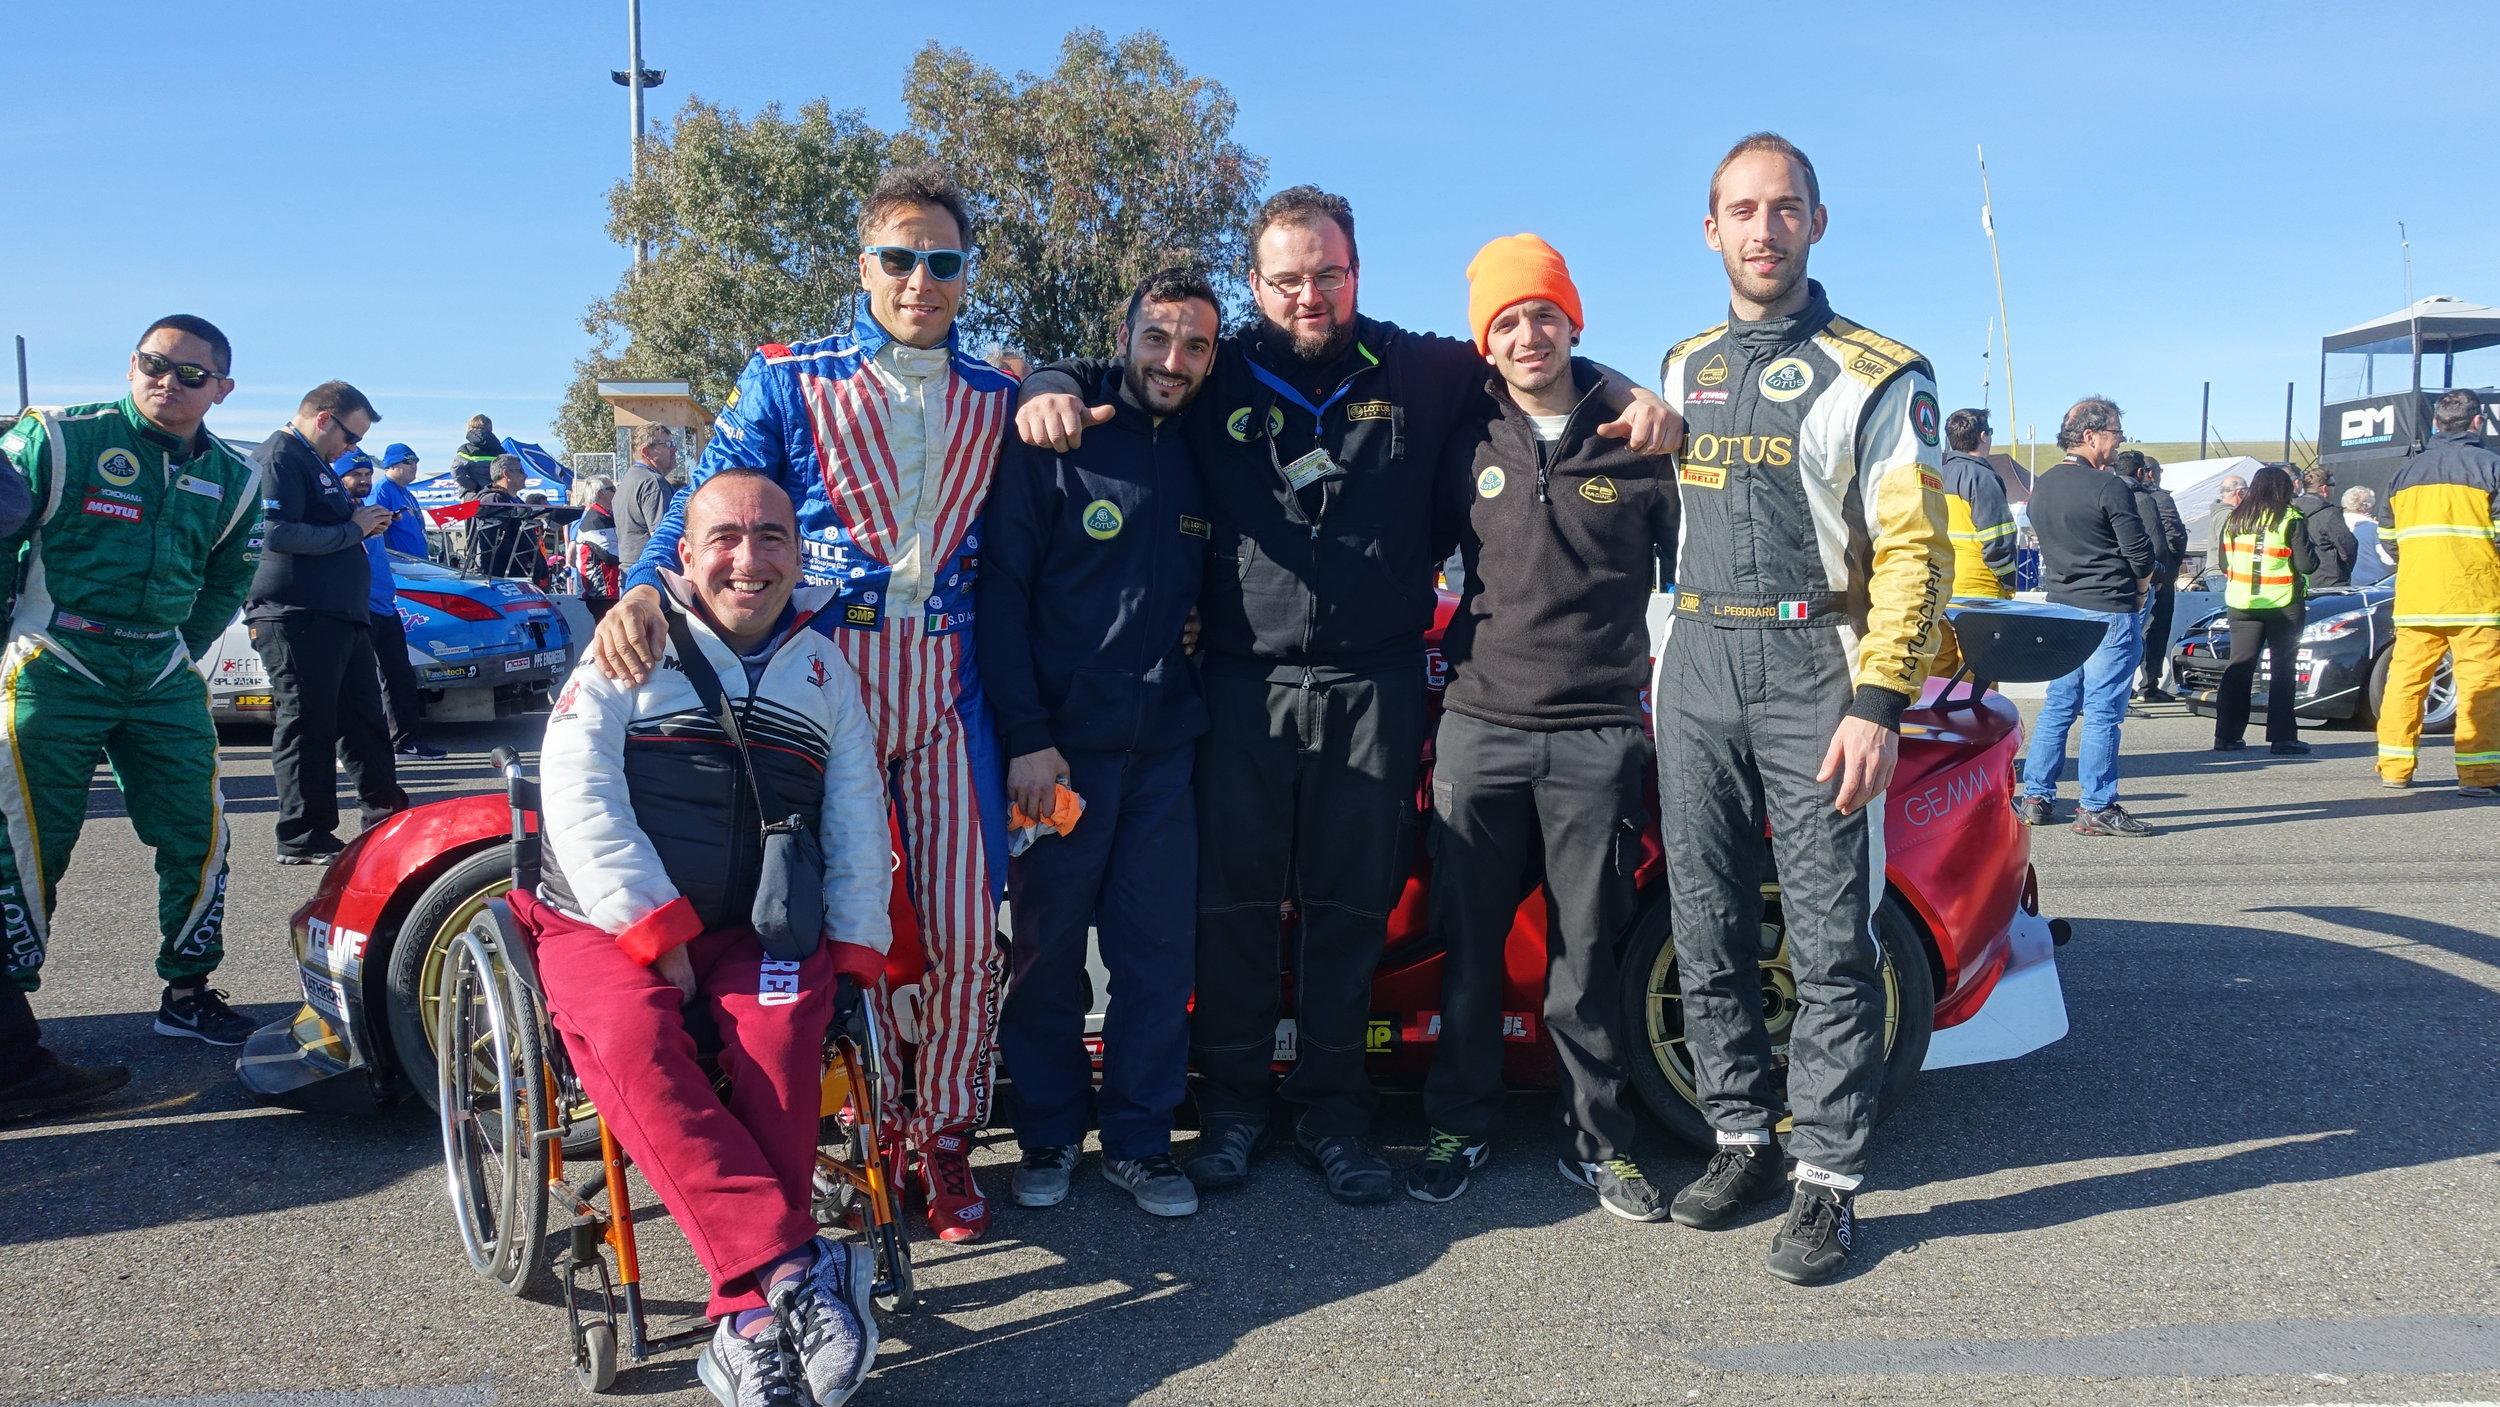 From left to right: Checco, Stefano, Andrea, Carlo, Luca, and Lorenzo